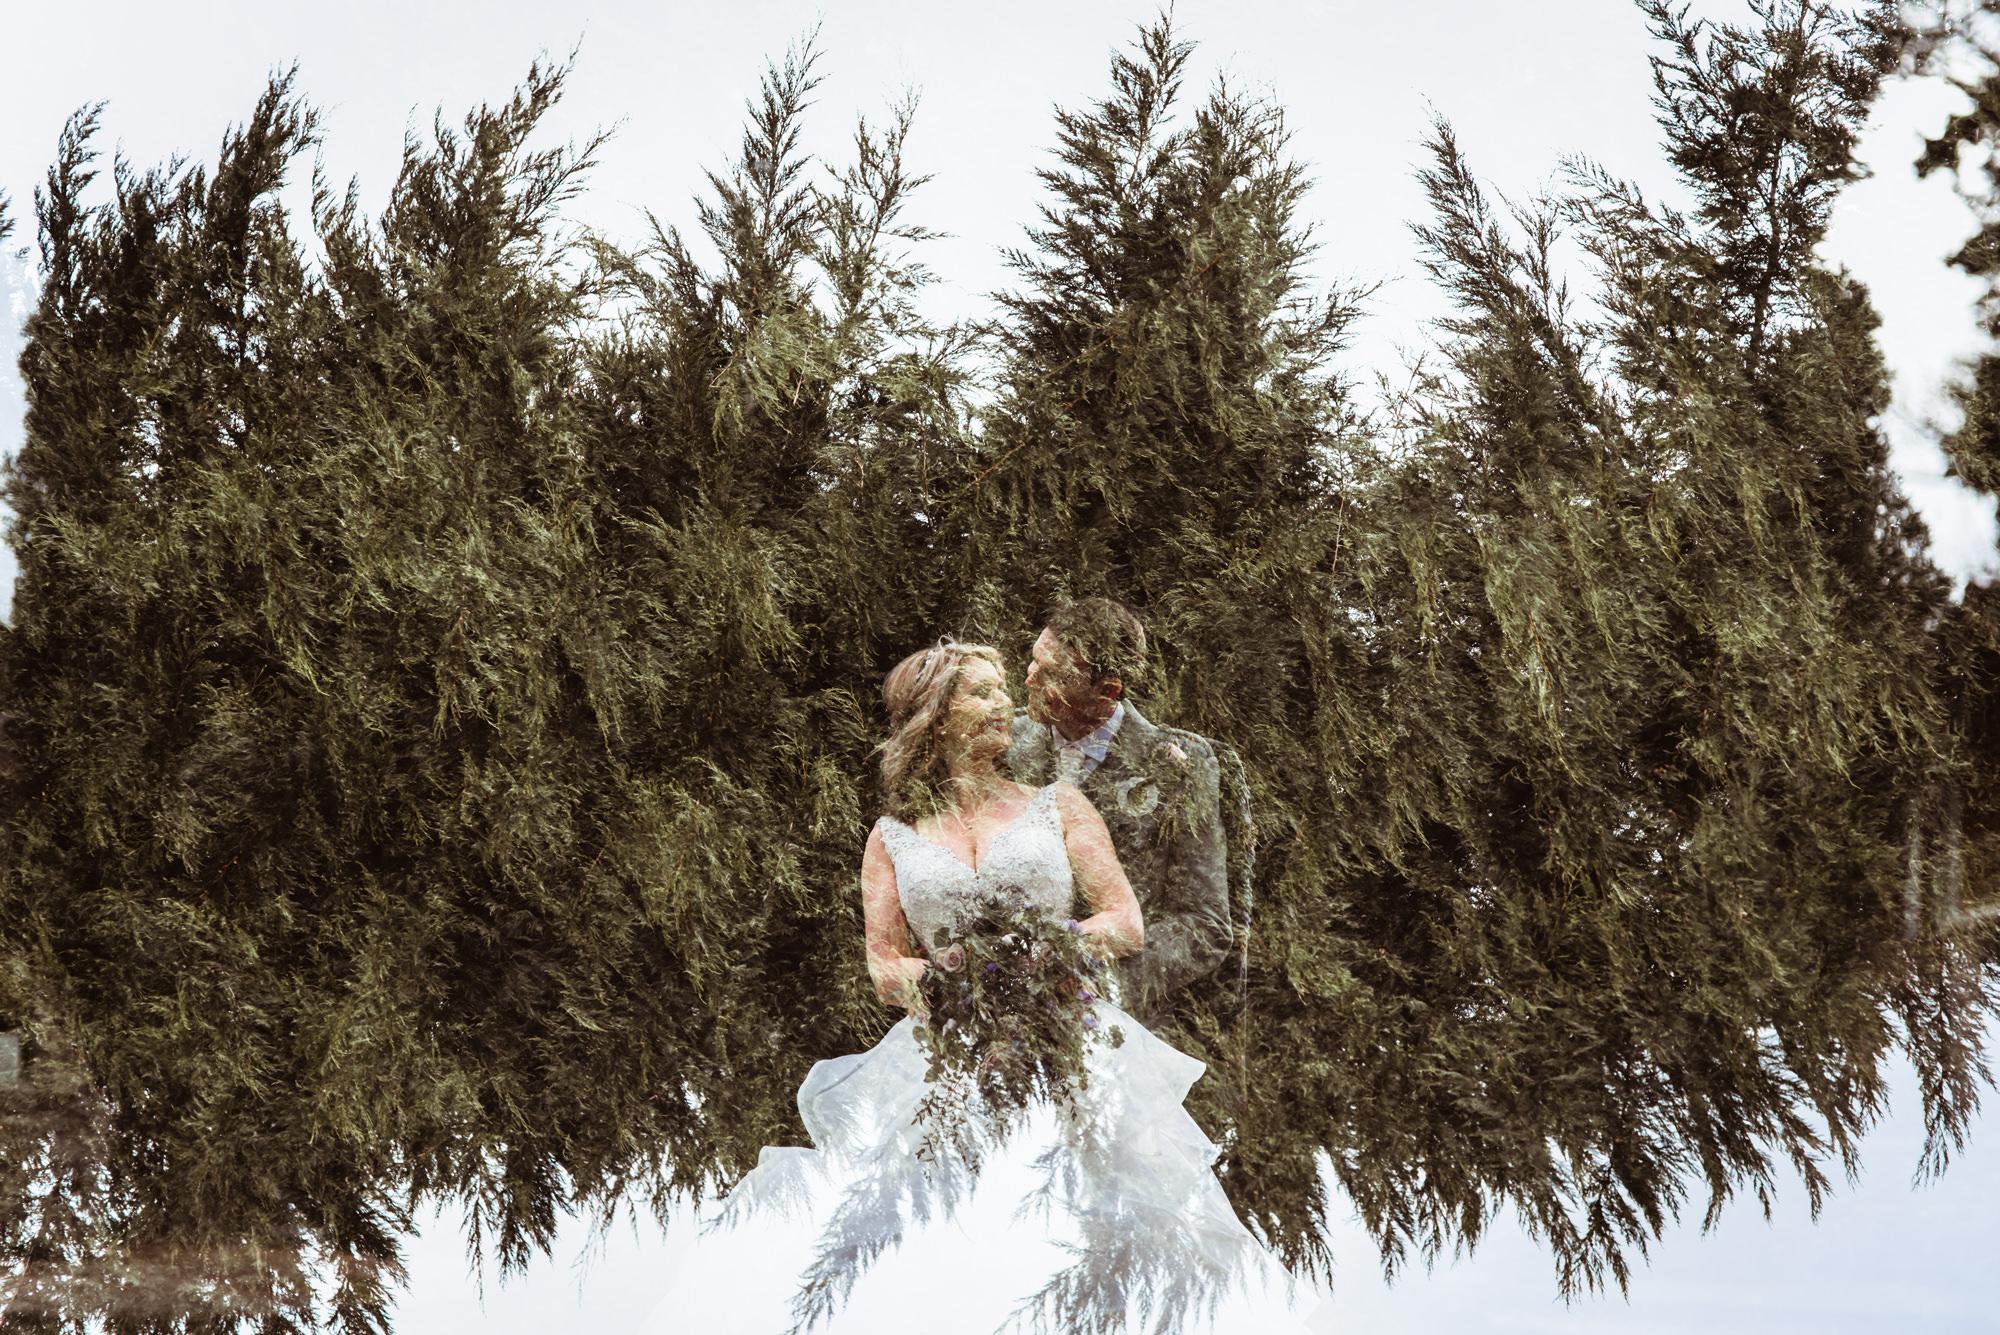 creative-wedding-photographer-loch-lomond.jpg